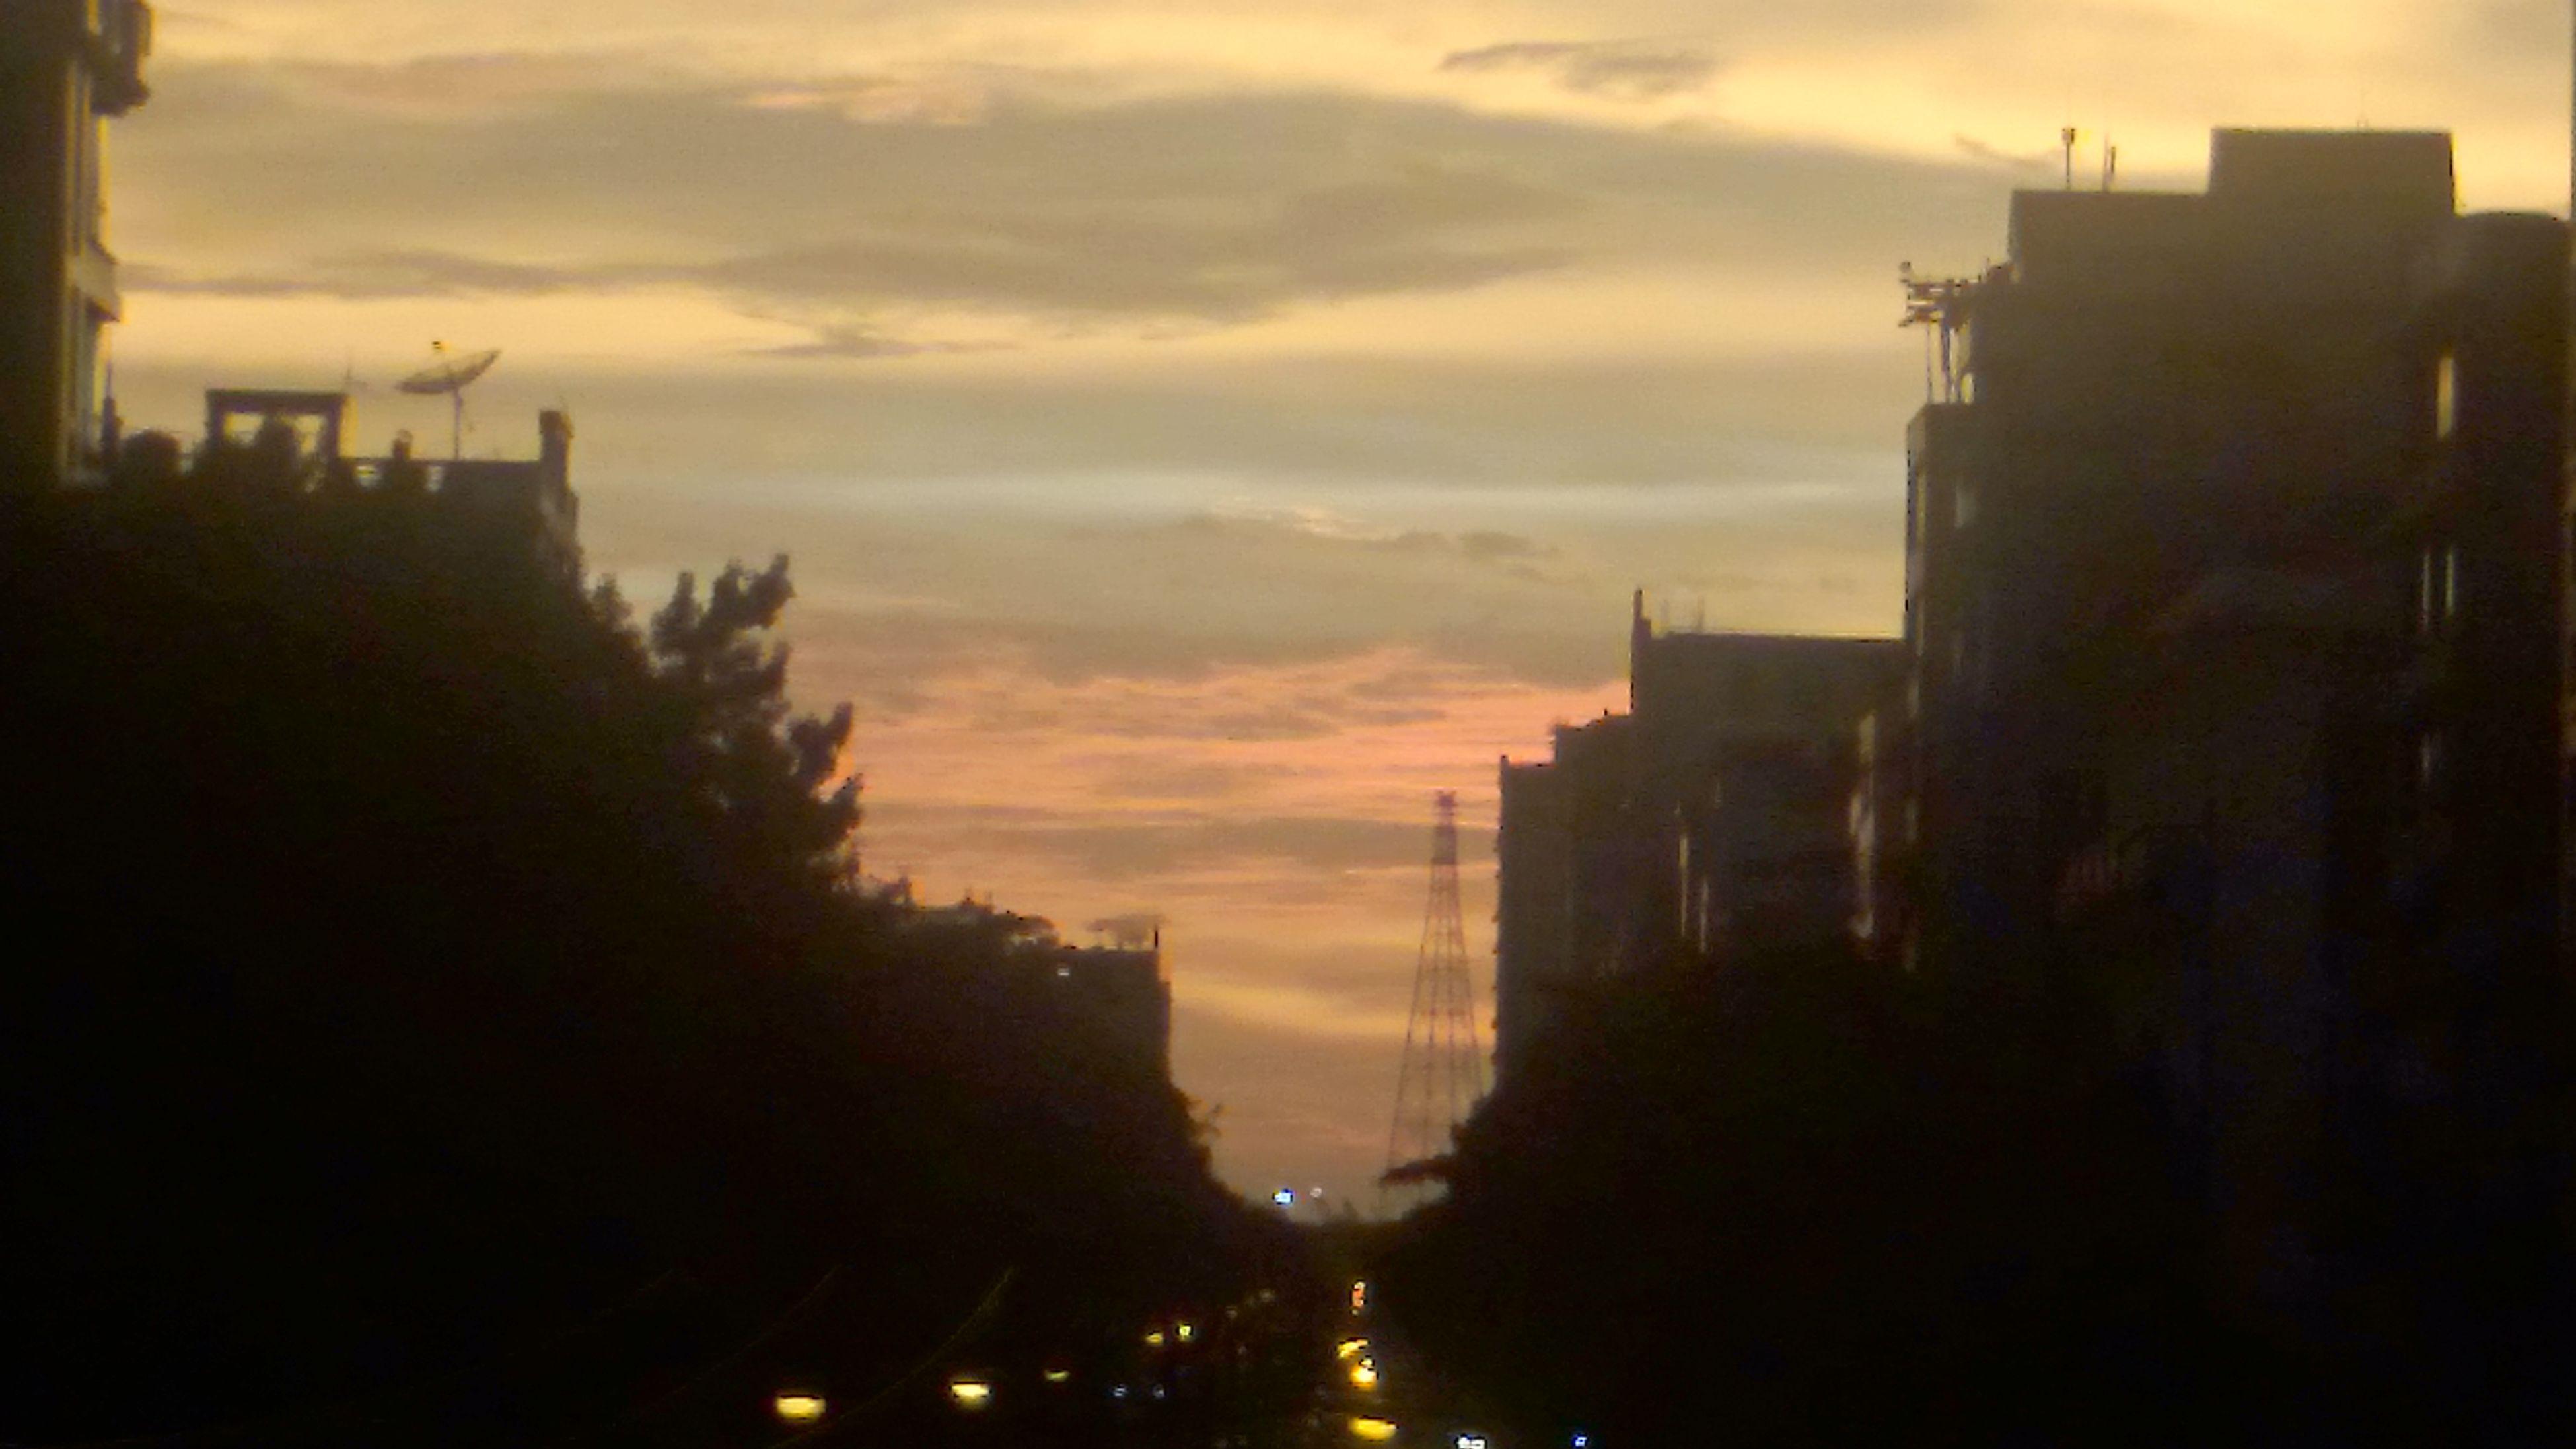 TBT  Zoom 8x Evening Sunset